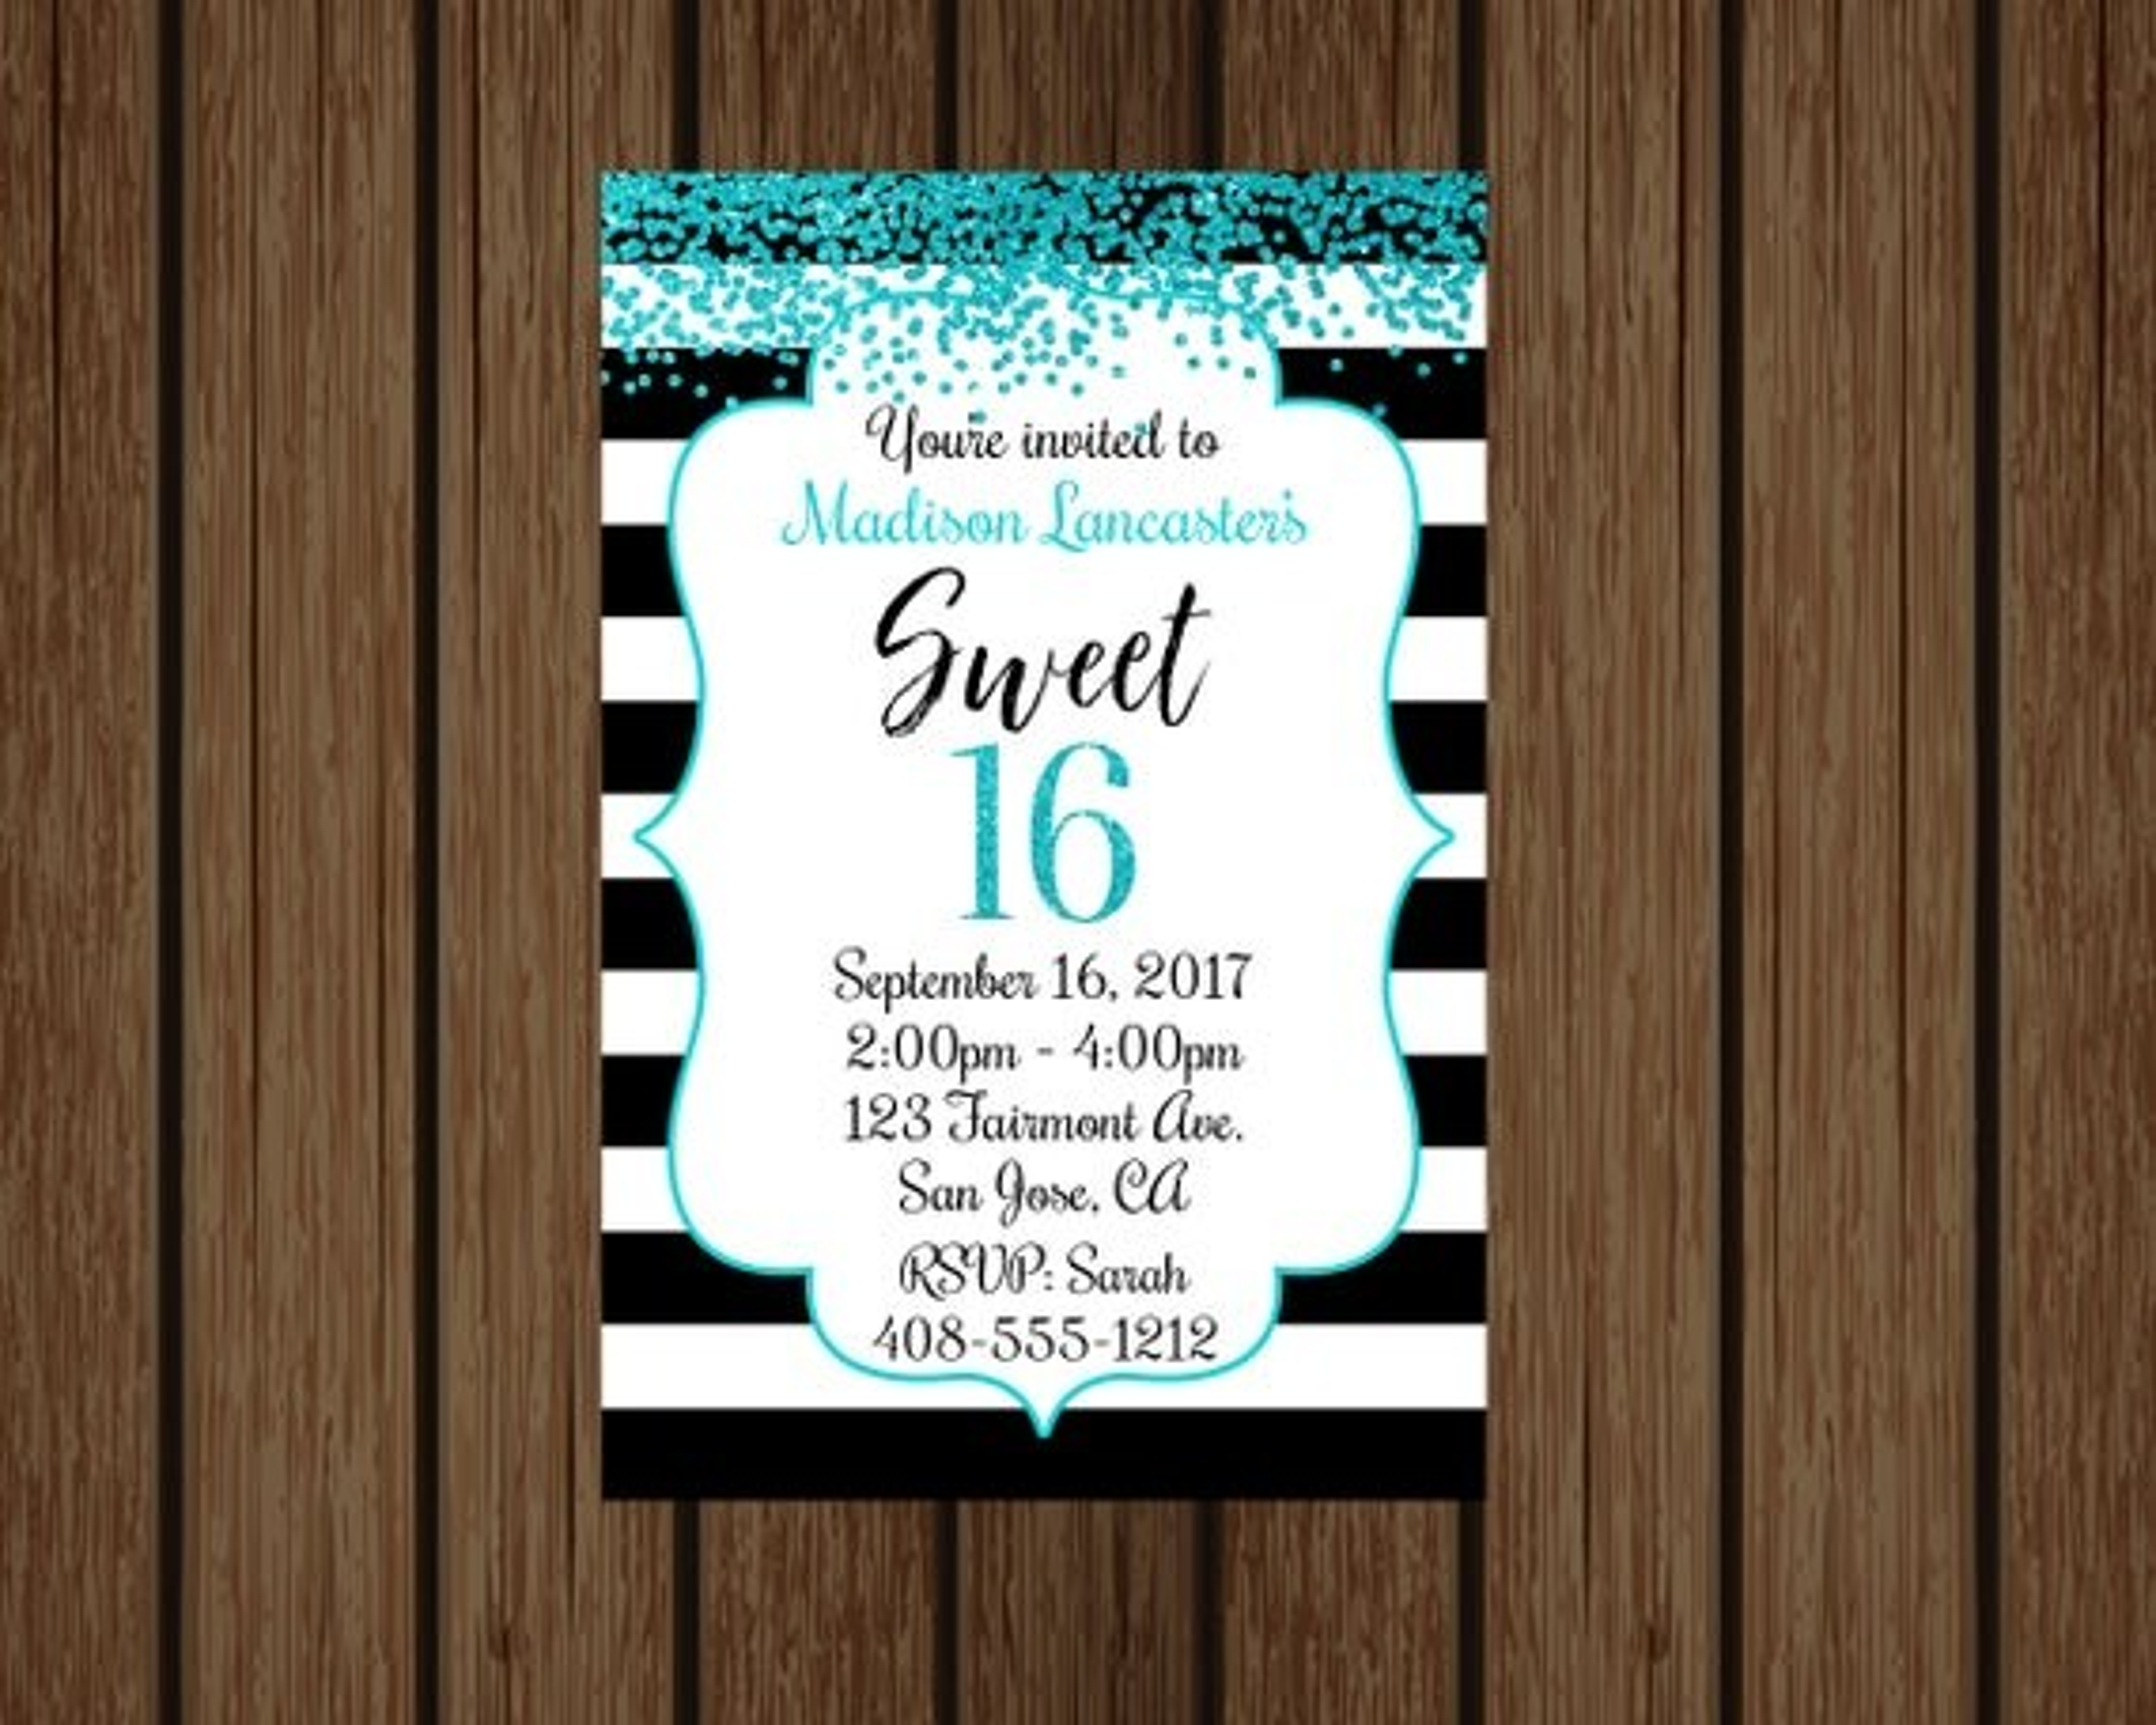 Kinko S Sweet 16 Birthday Invitations